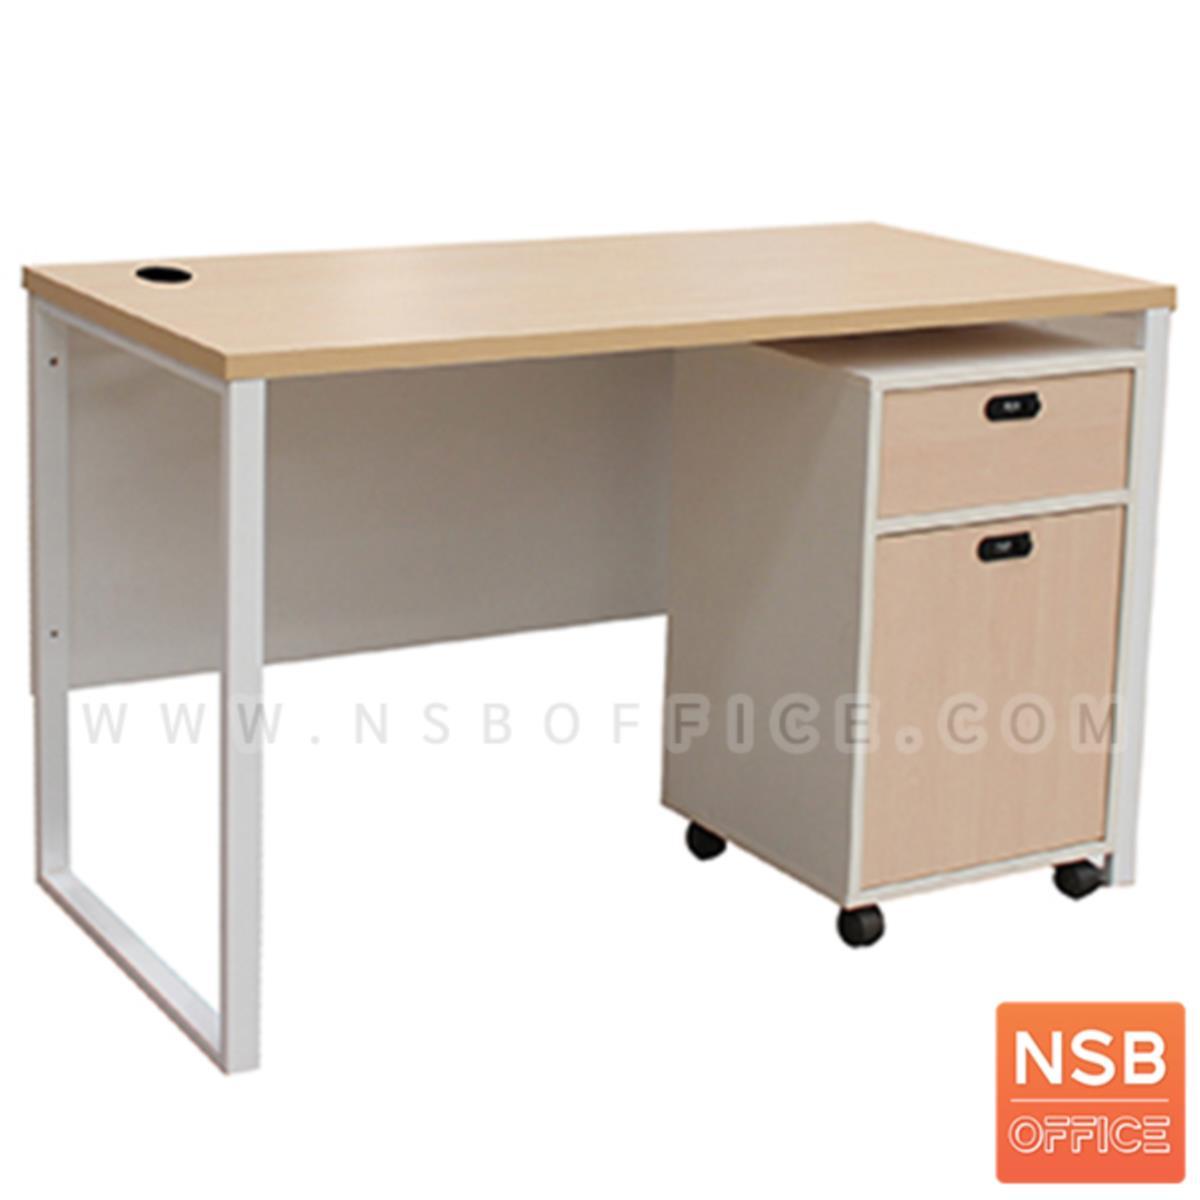 A12A080:โต๊ะทำงาน 1 ลิ้นชัก 1 บานเปิด ล้อเลื่อน รุ่น Folke (โฟล์ก) ขนาด 120W cm. มีกุญแจล็อครหัส ขาเหล็ก